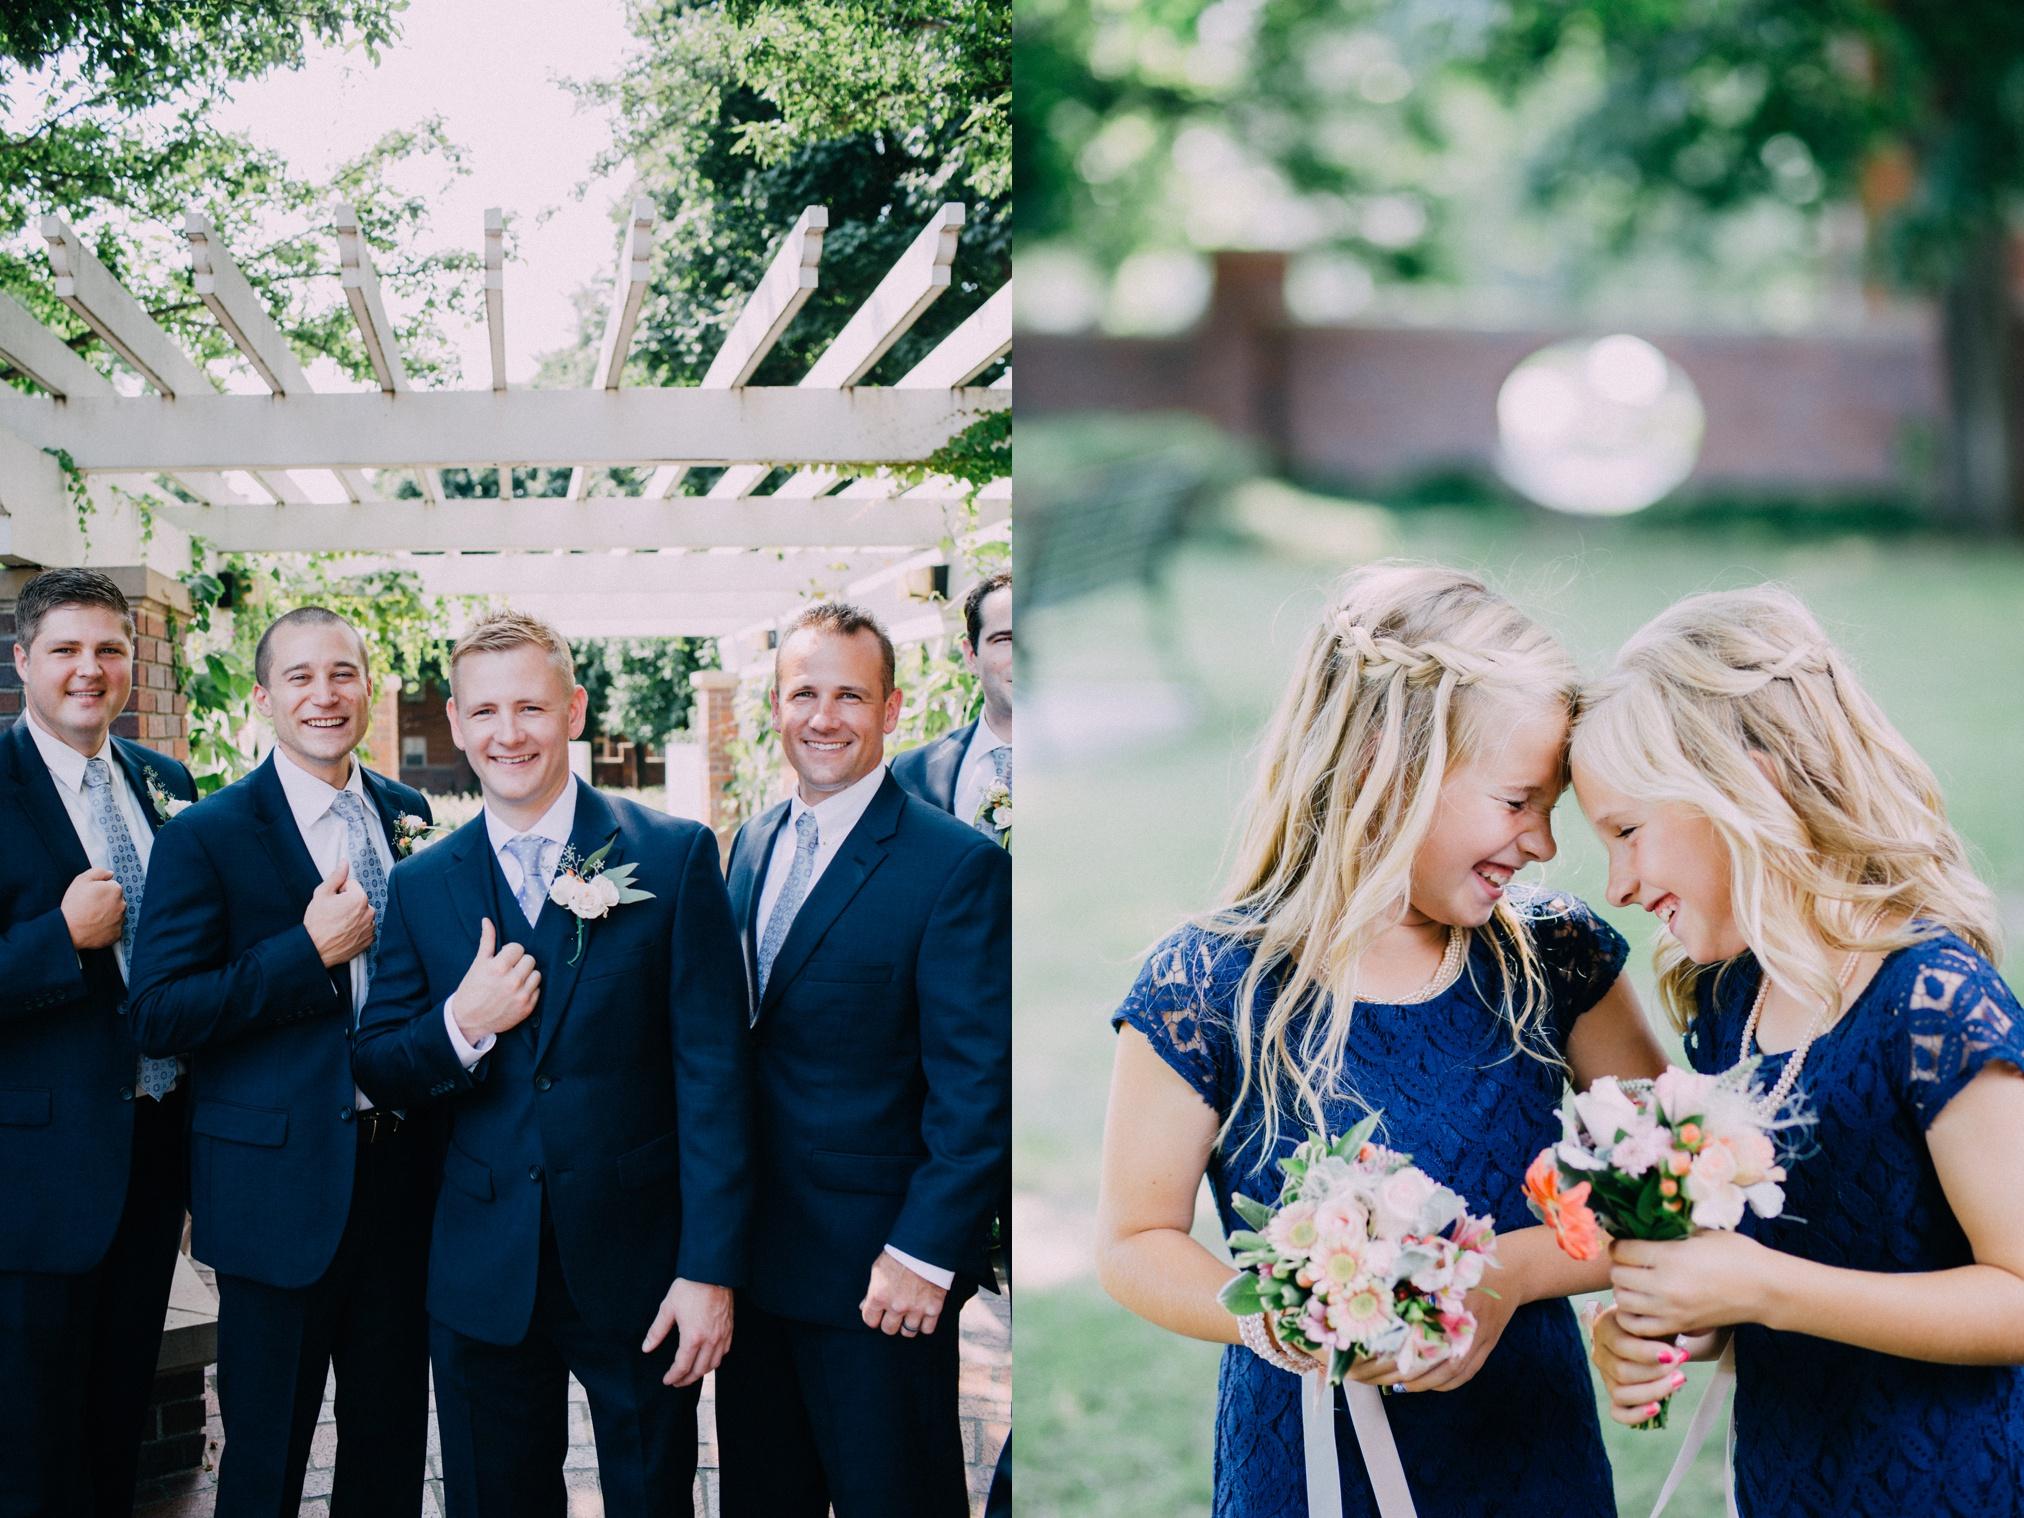 brenna+michael_wedding-304.jpg